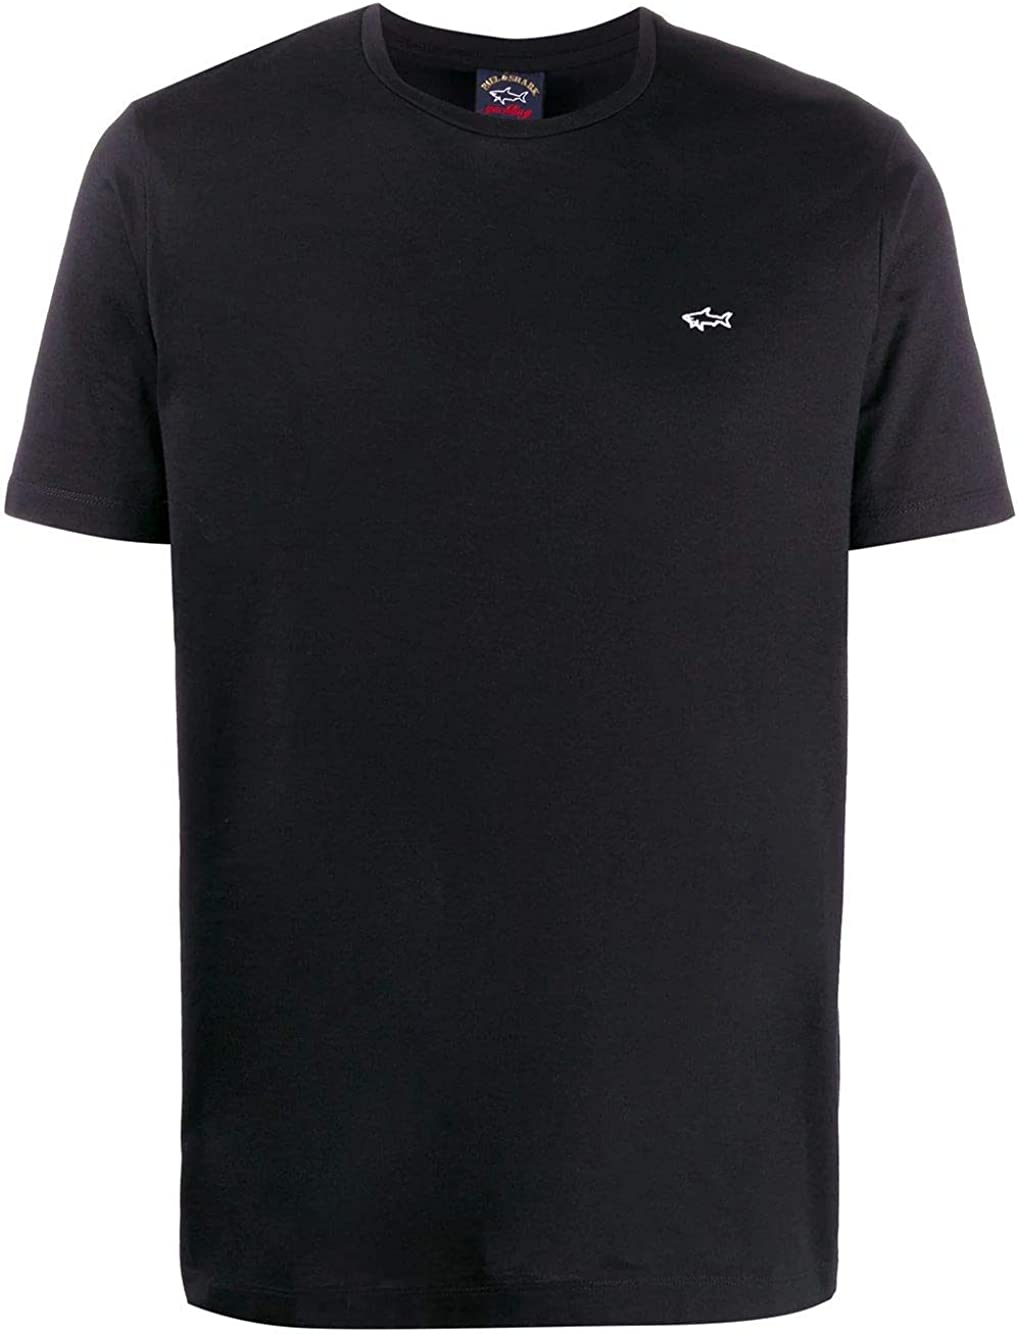 PAUL & SHARK Luxury Fashion Man E20P1074011 Black Cotton T-Shirt   Spring Summer 20